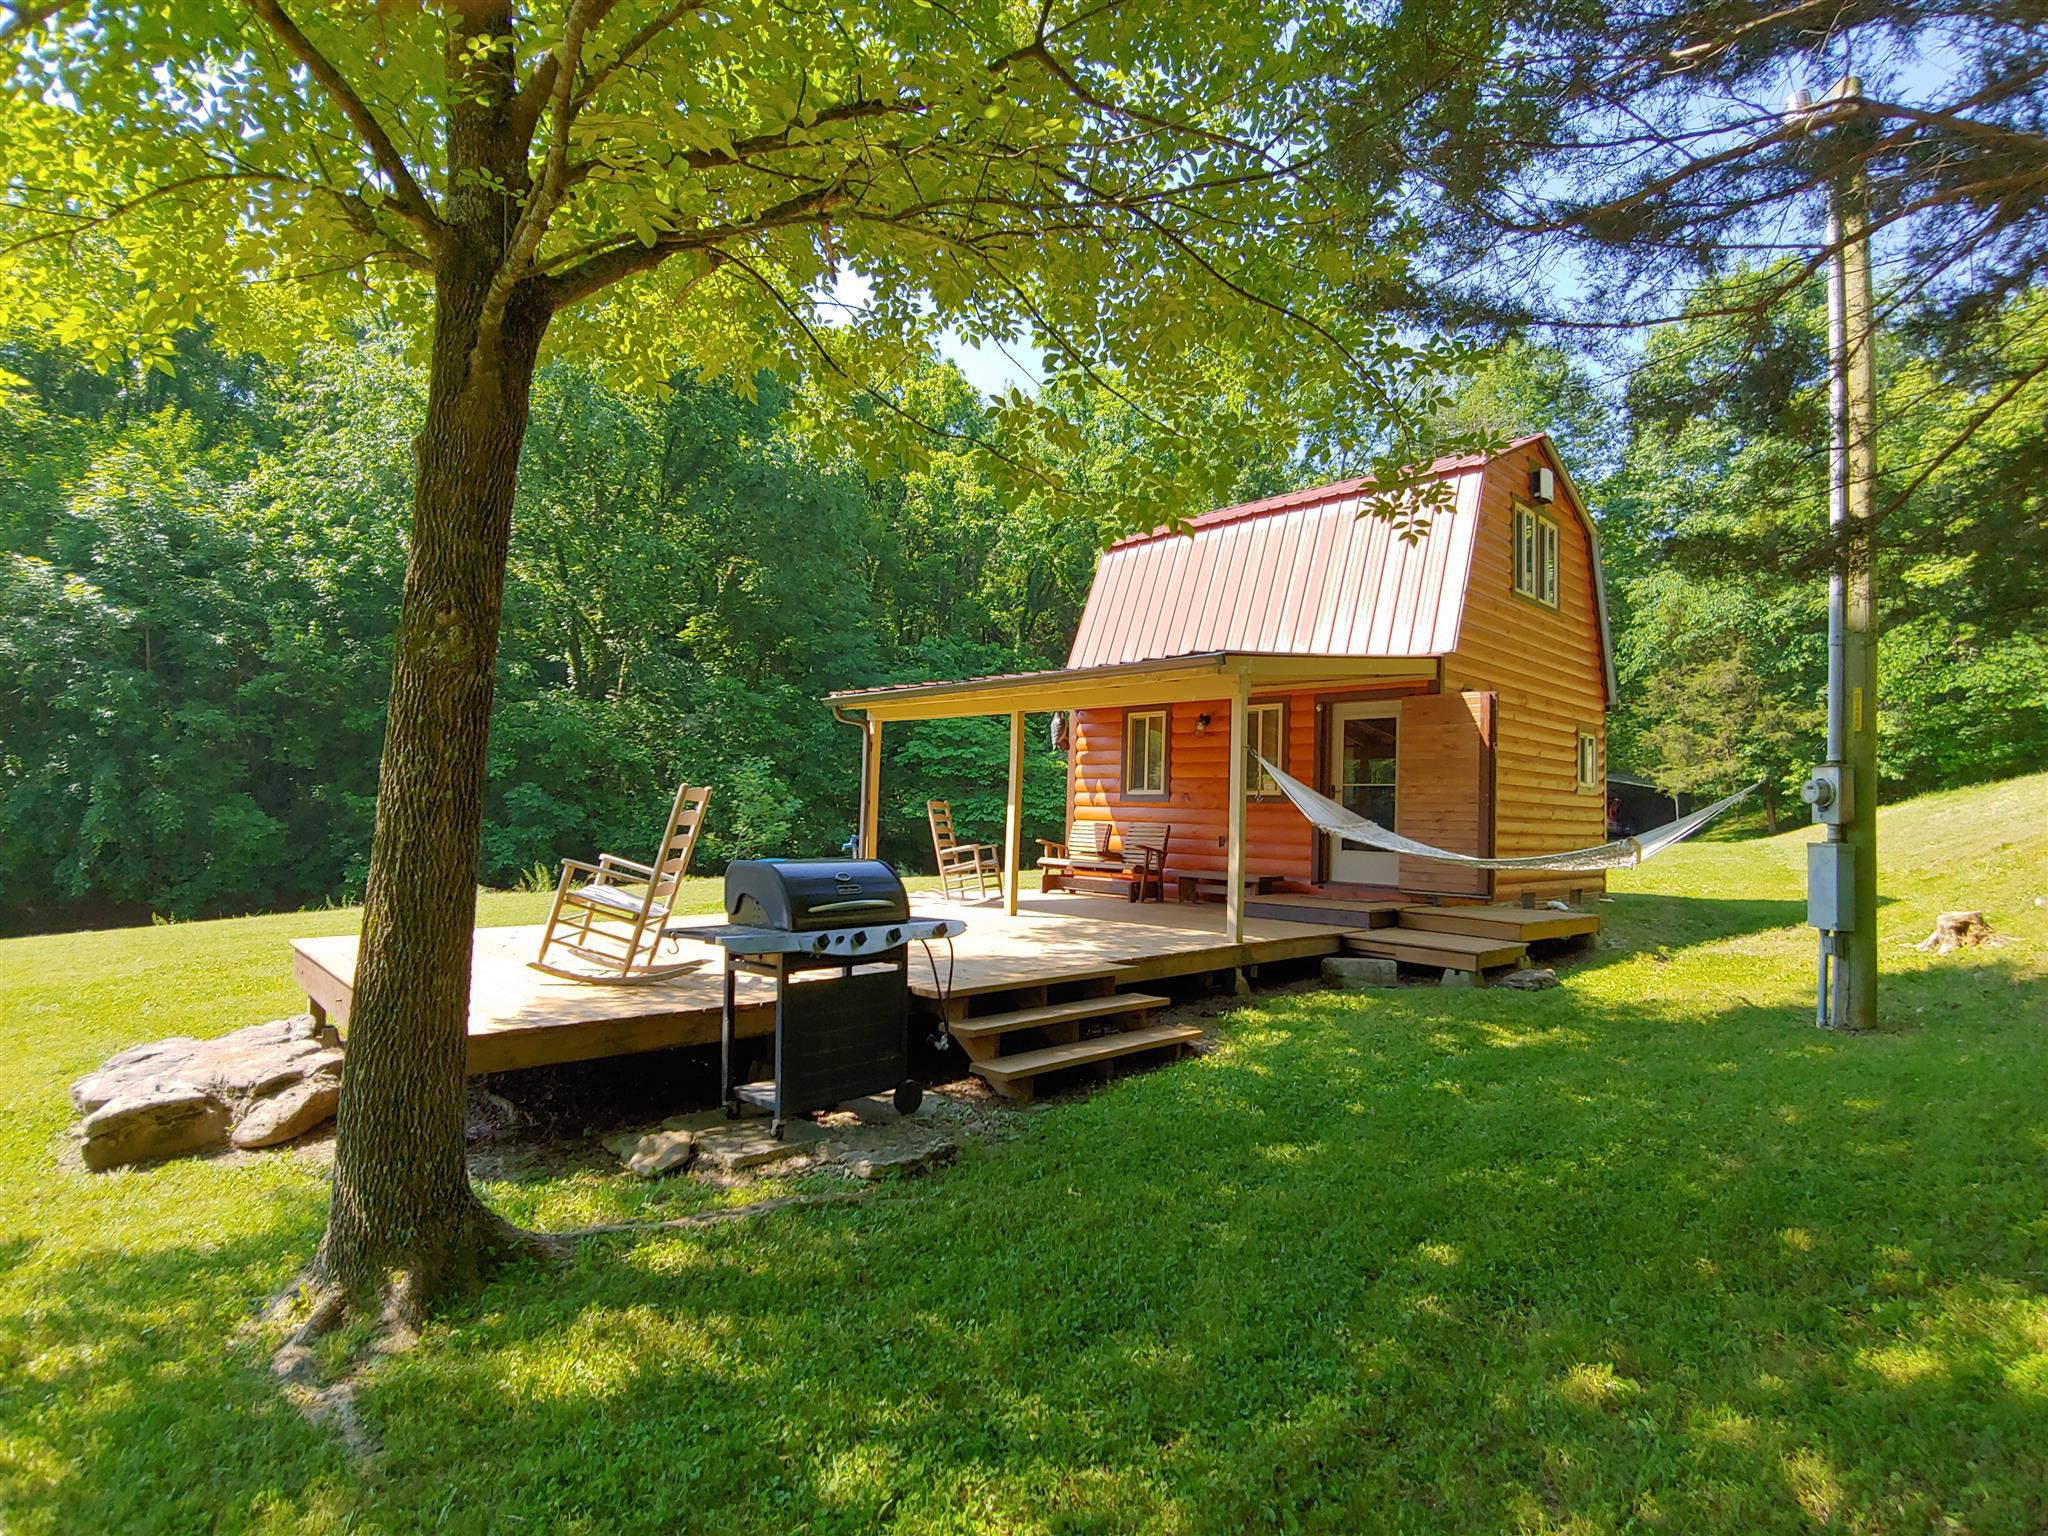 97 Sullivans Bend Rd, Elmwood, TN 38560 - Elmwood, TN real estate listing